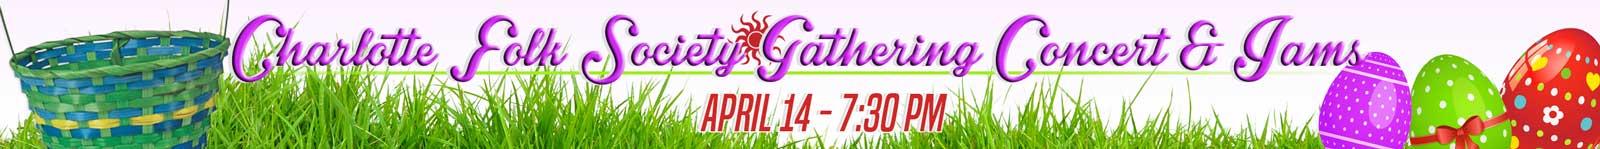 Charlotte Folk Society Gathering Concert & Jams